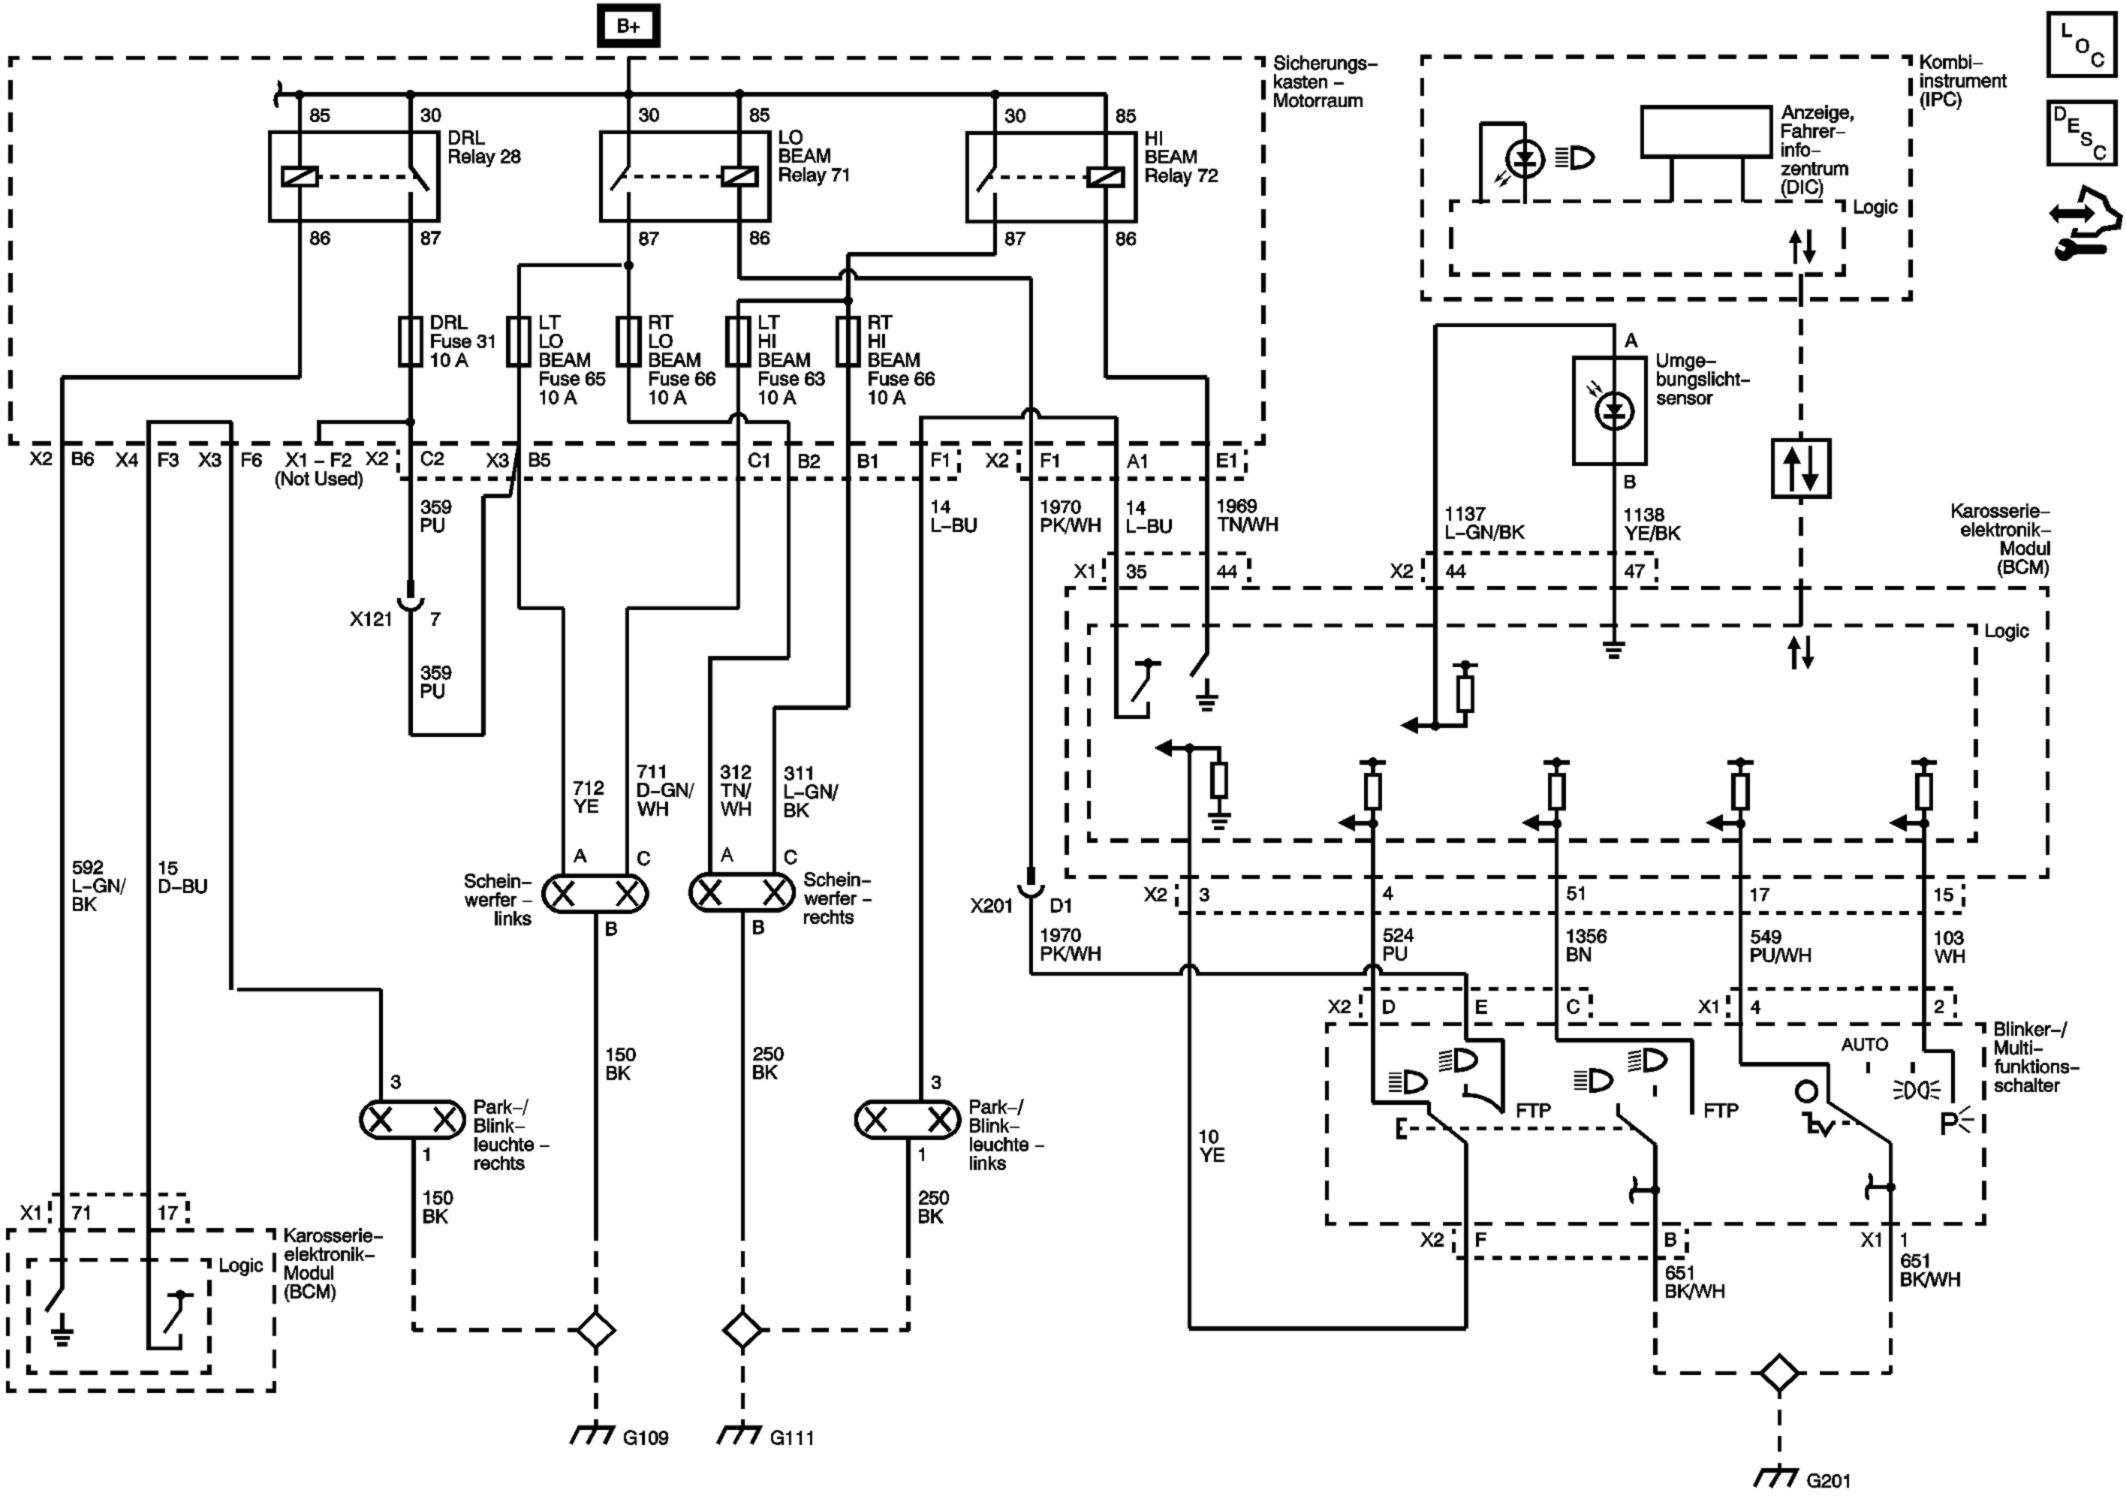 interior hhr stereo wiring diagram wiring diagram databasetahoe drivers door wiring diagram chevy hhr fuse